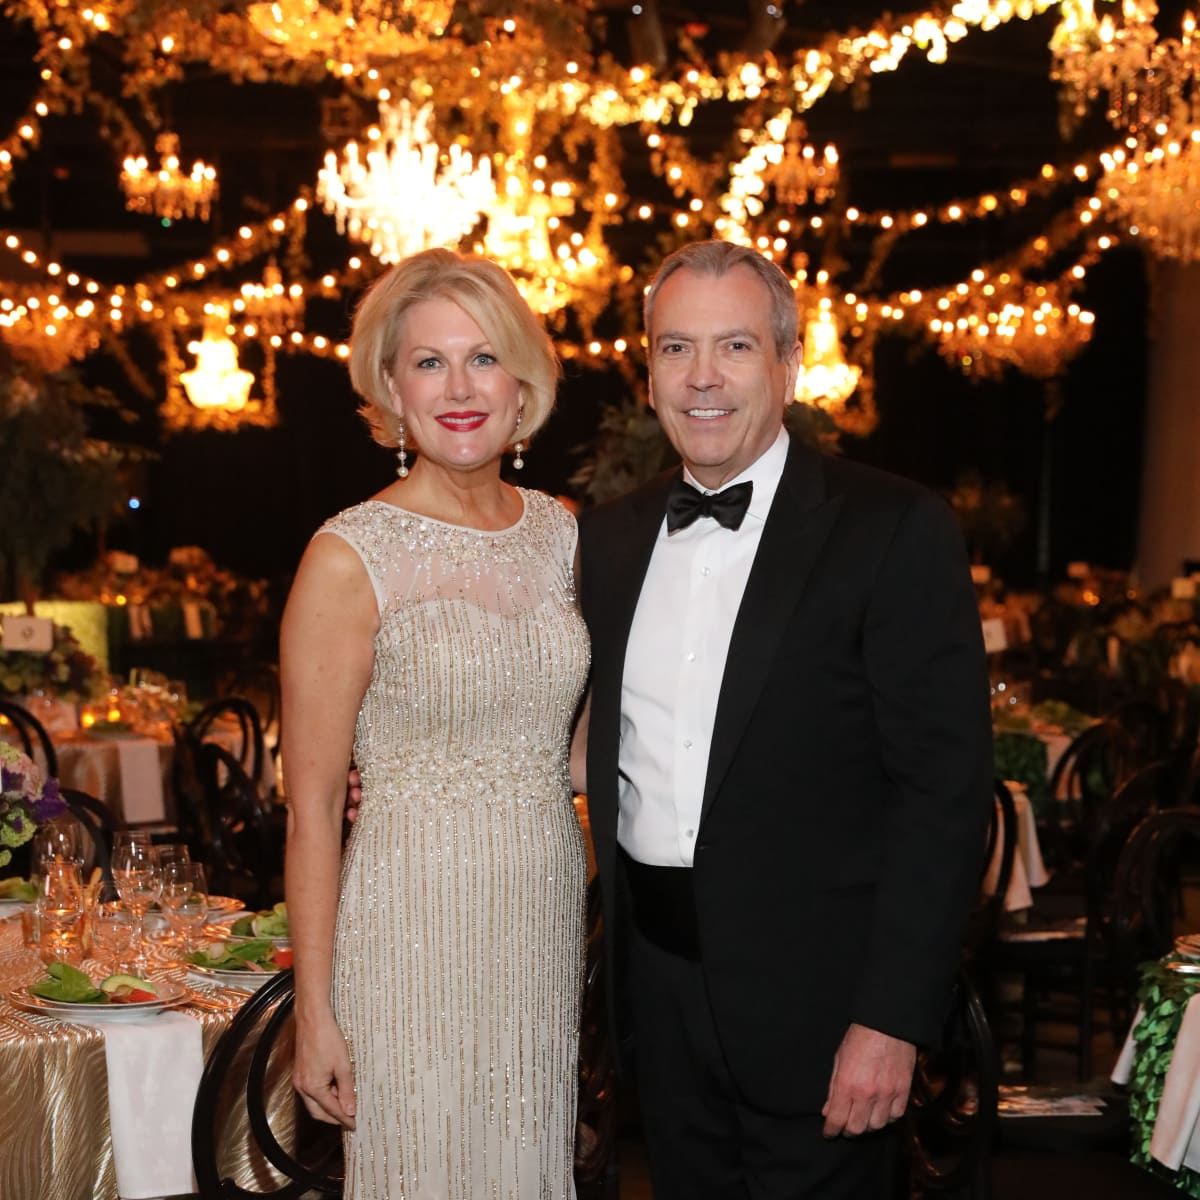 Bob Devlin and Kendra Rohrer